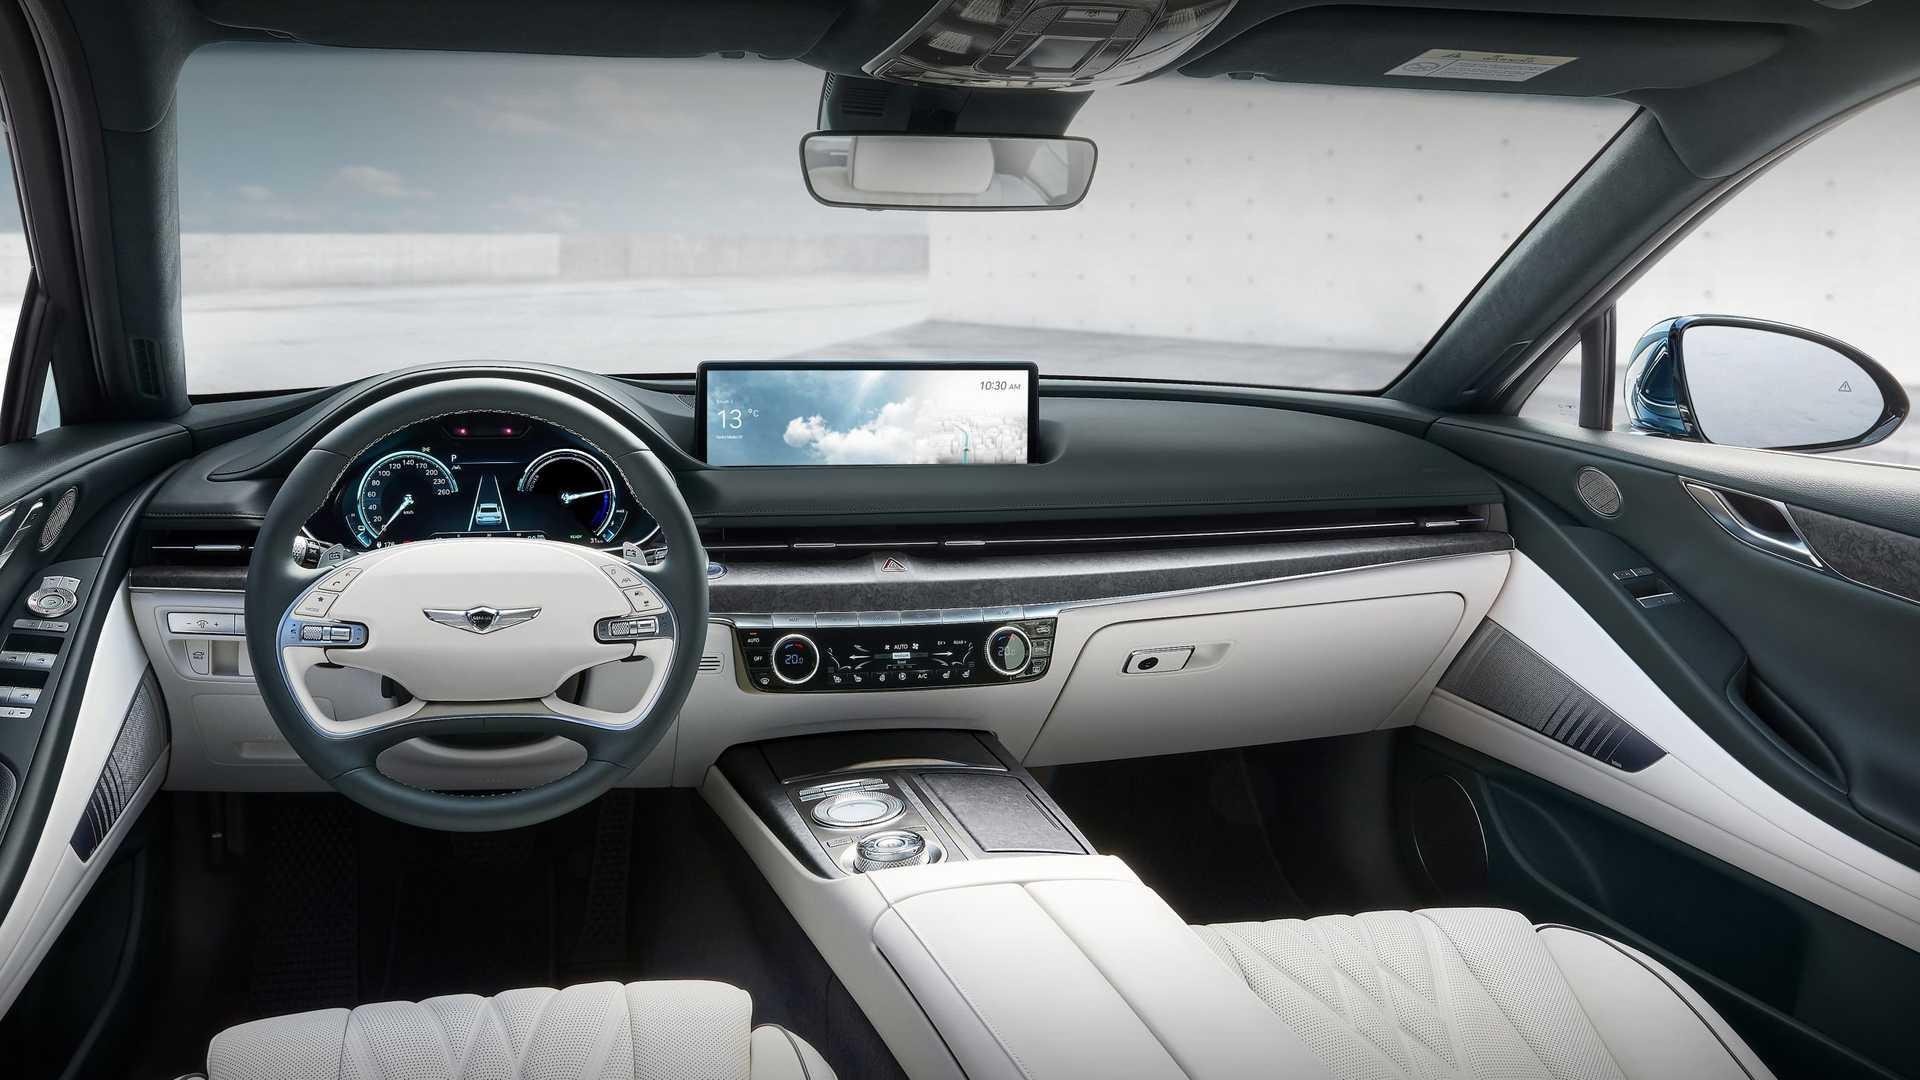 Genesis G80 Electric Interior